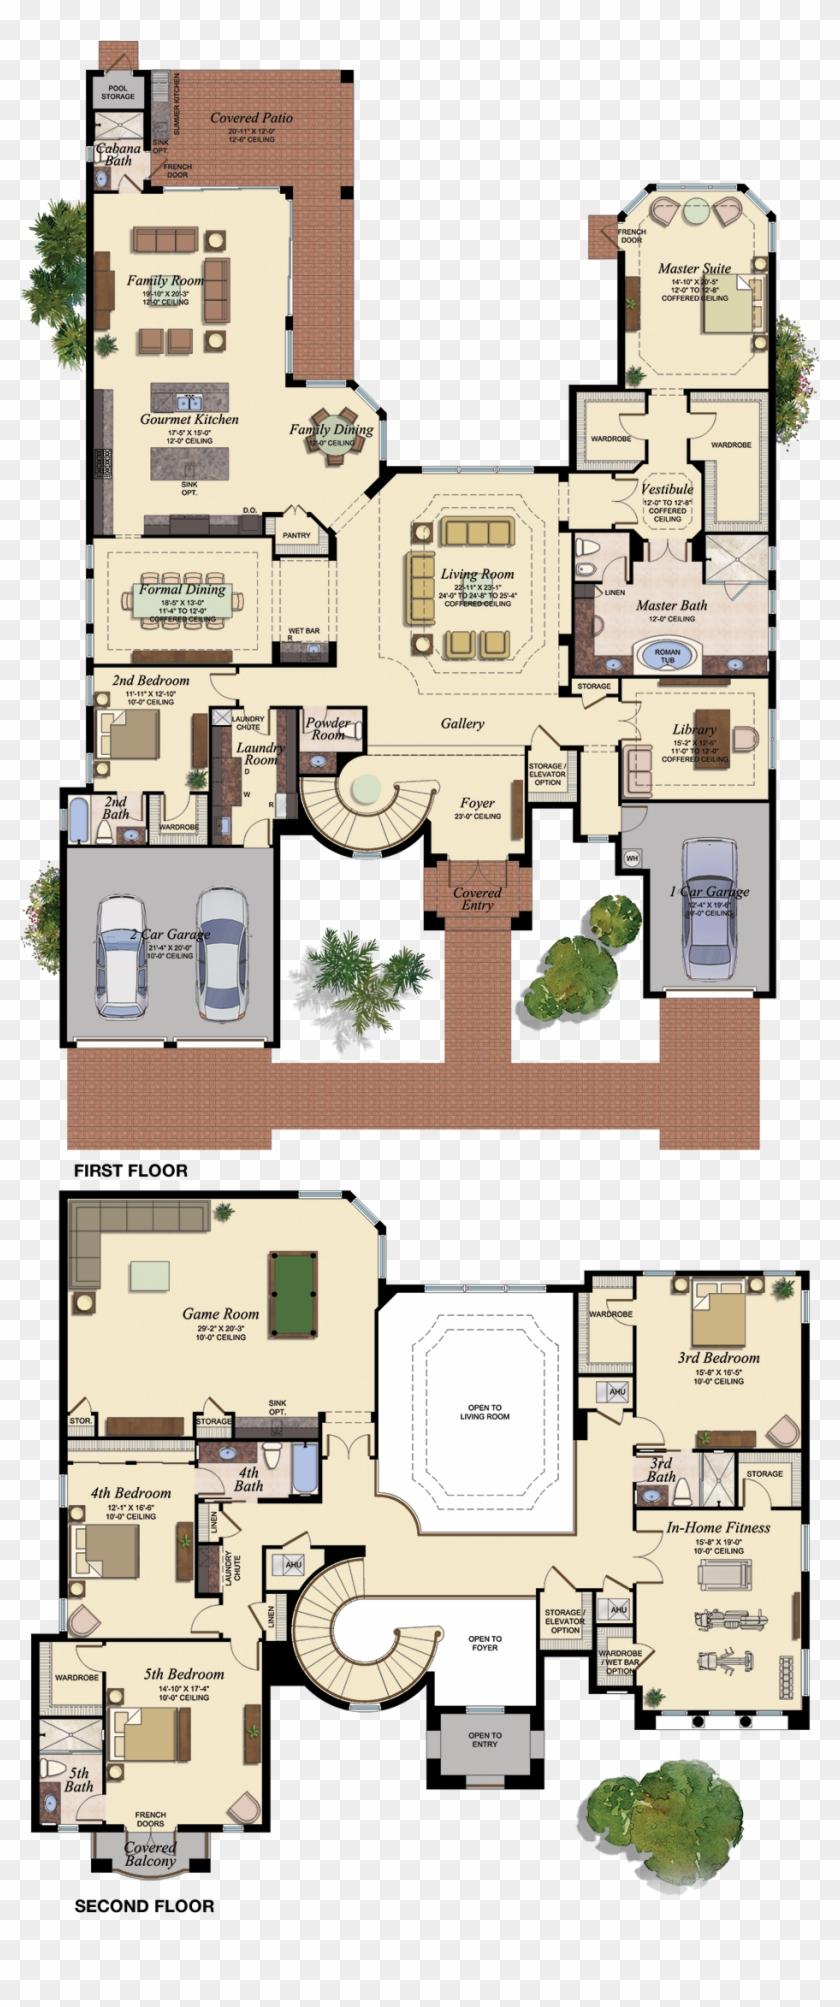 Gl Homes Boca Raton Houses Floor Plans Free Transparent Png Clipart Images Download